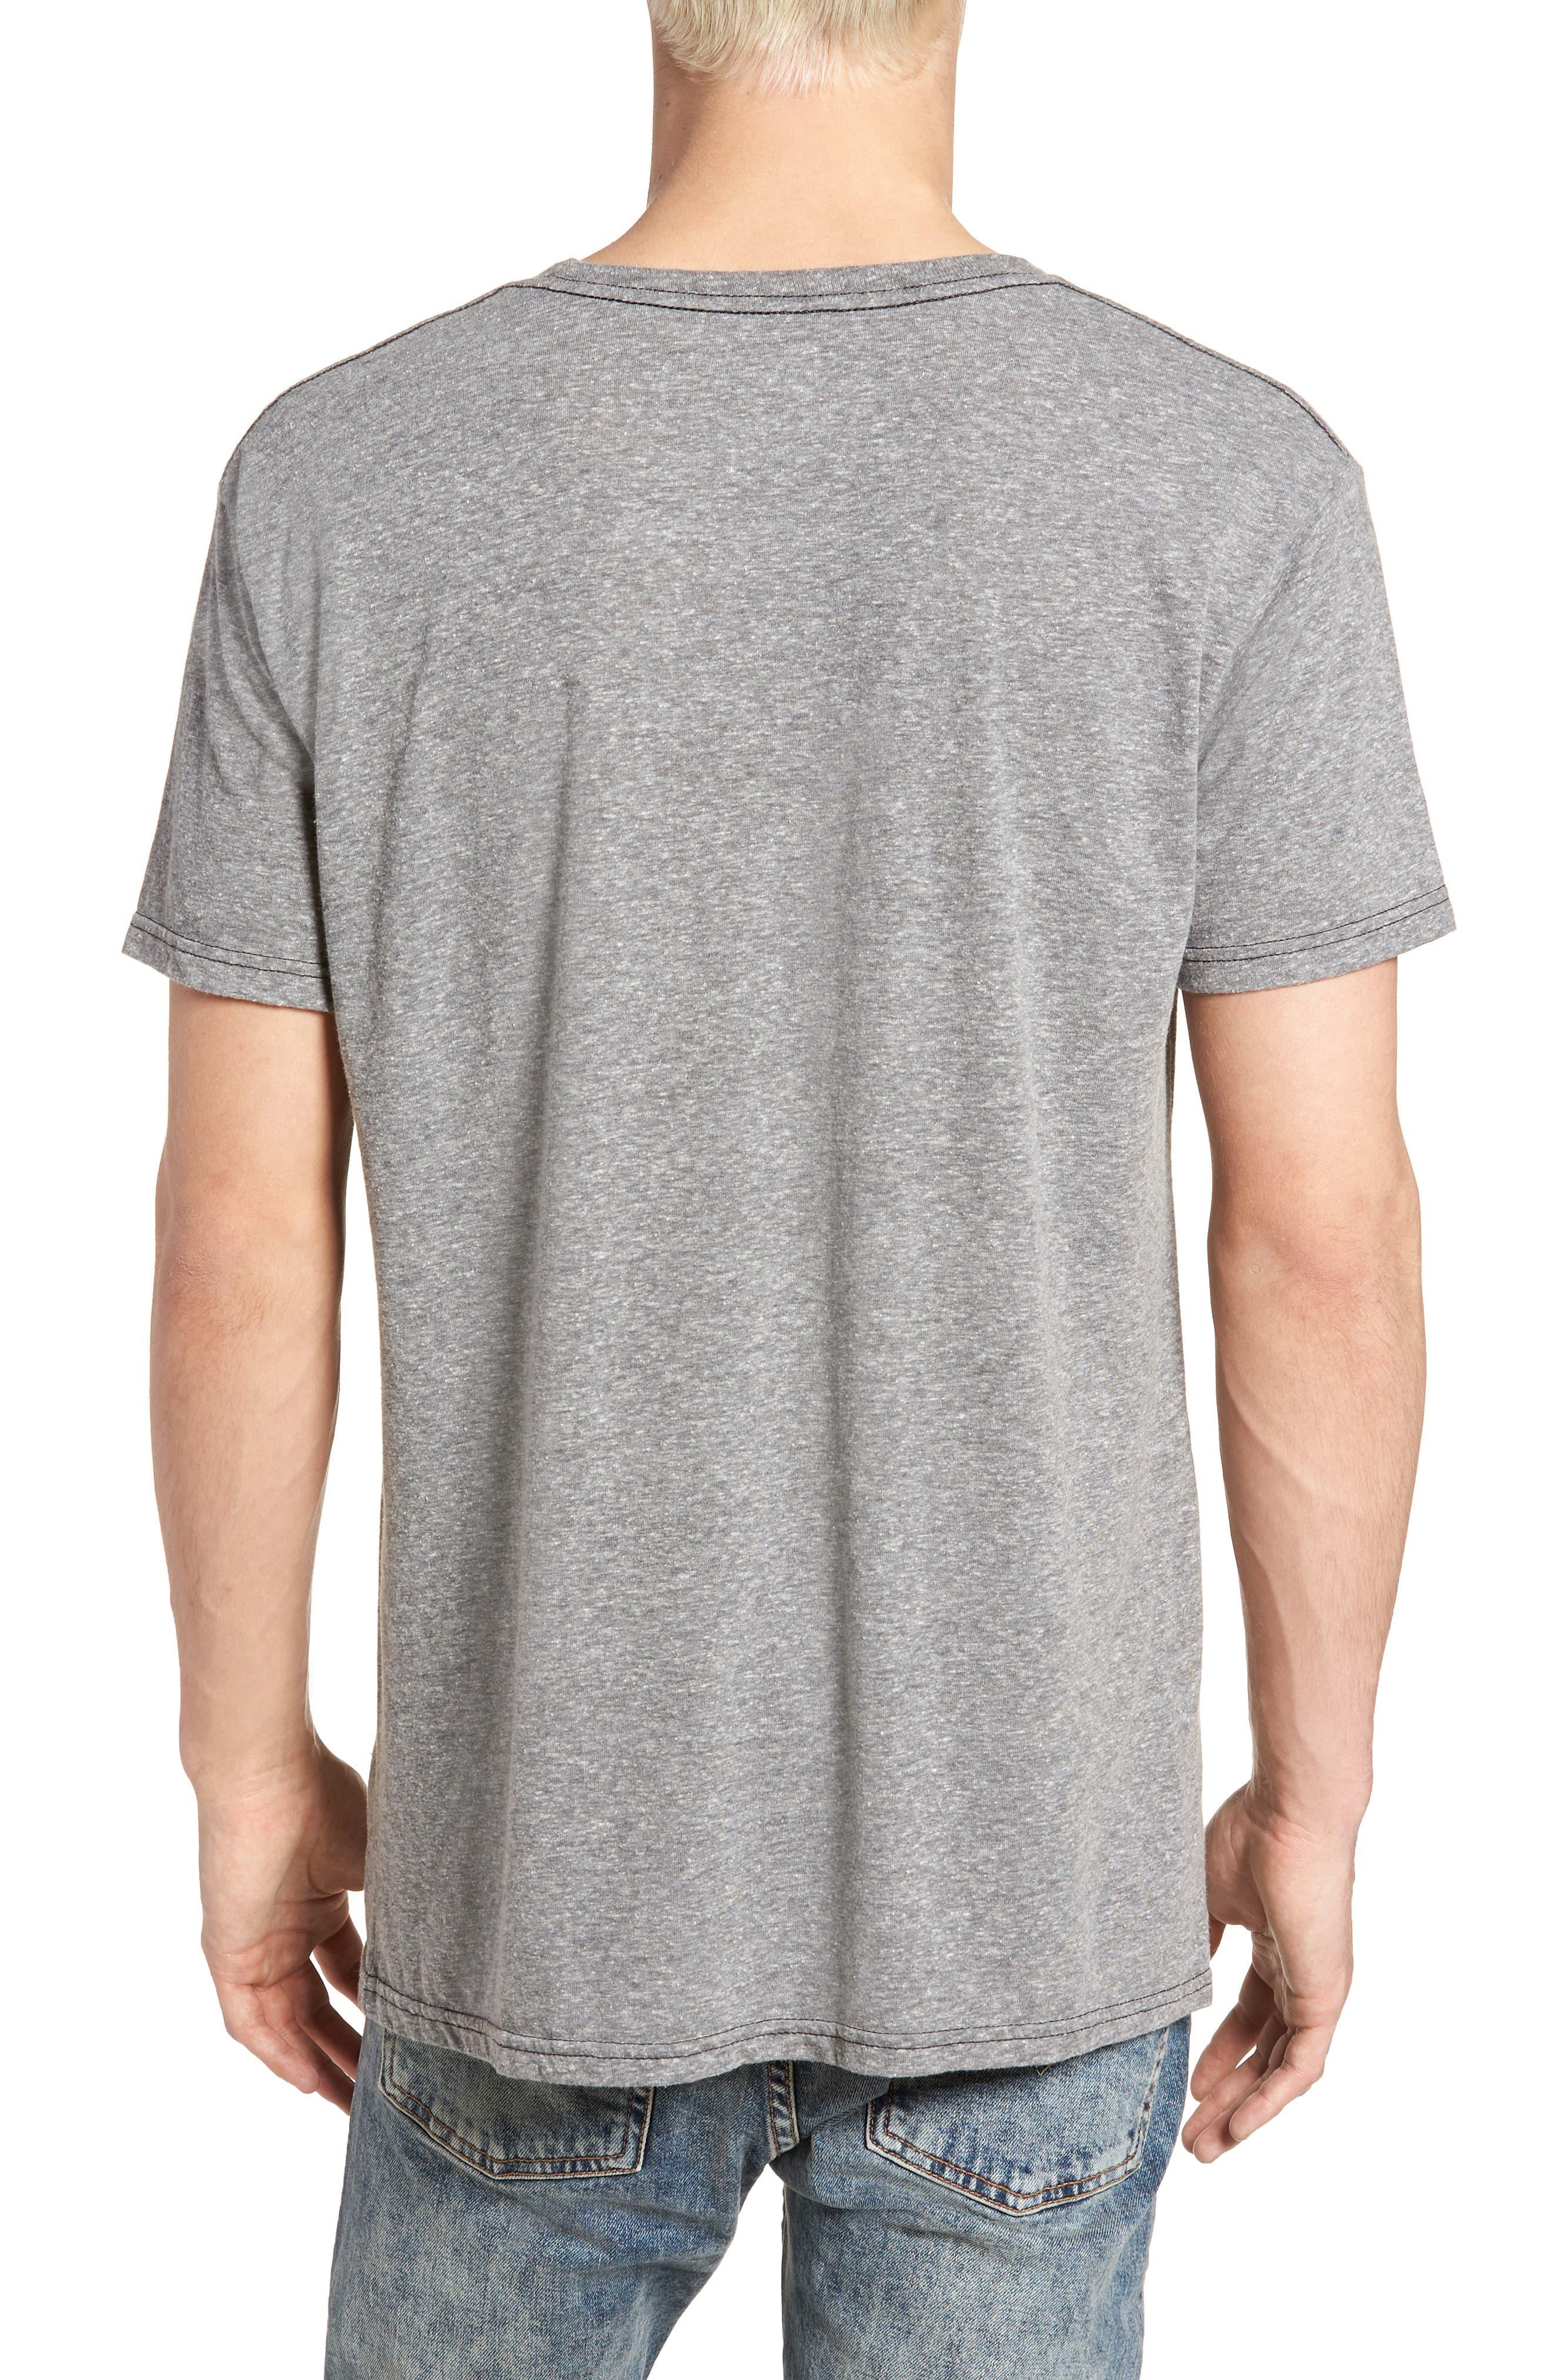 RETRO BRAND,                             Original Retro Brand Silver Bullet Graphic T-Shirt,                             Alternate thumbnail 2, color,                             020